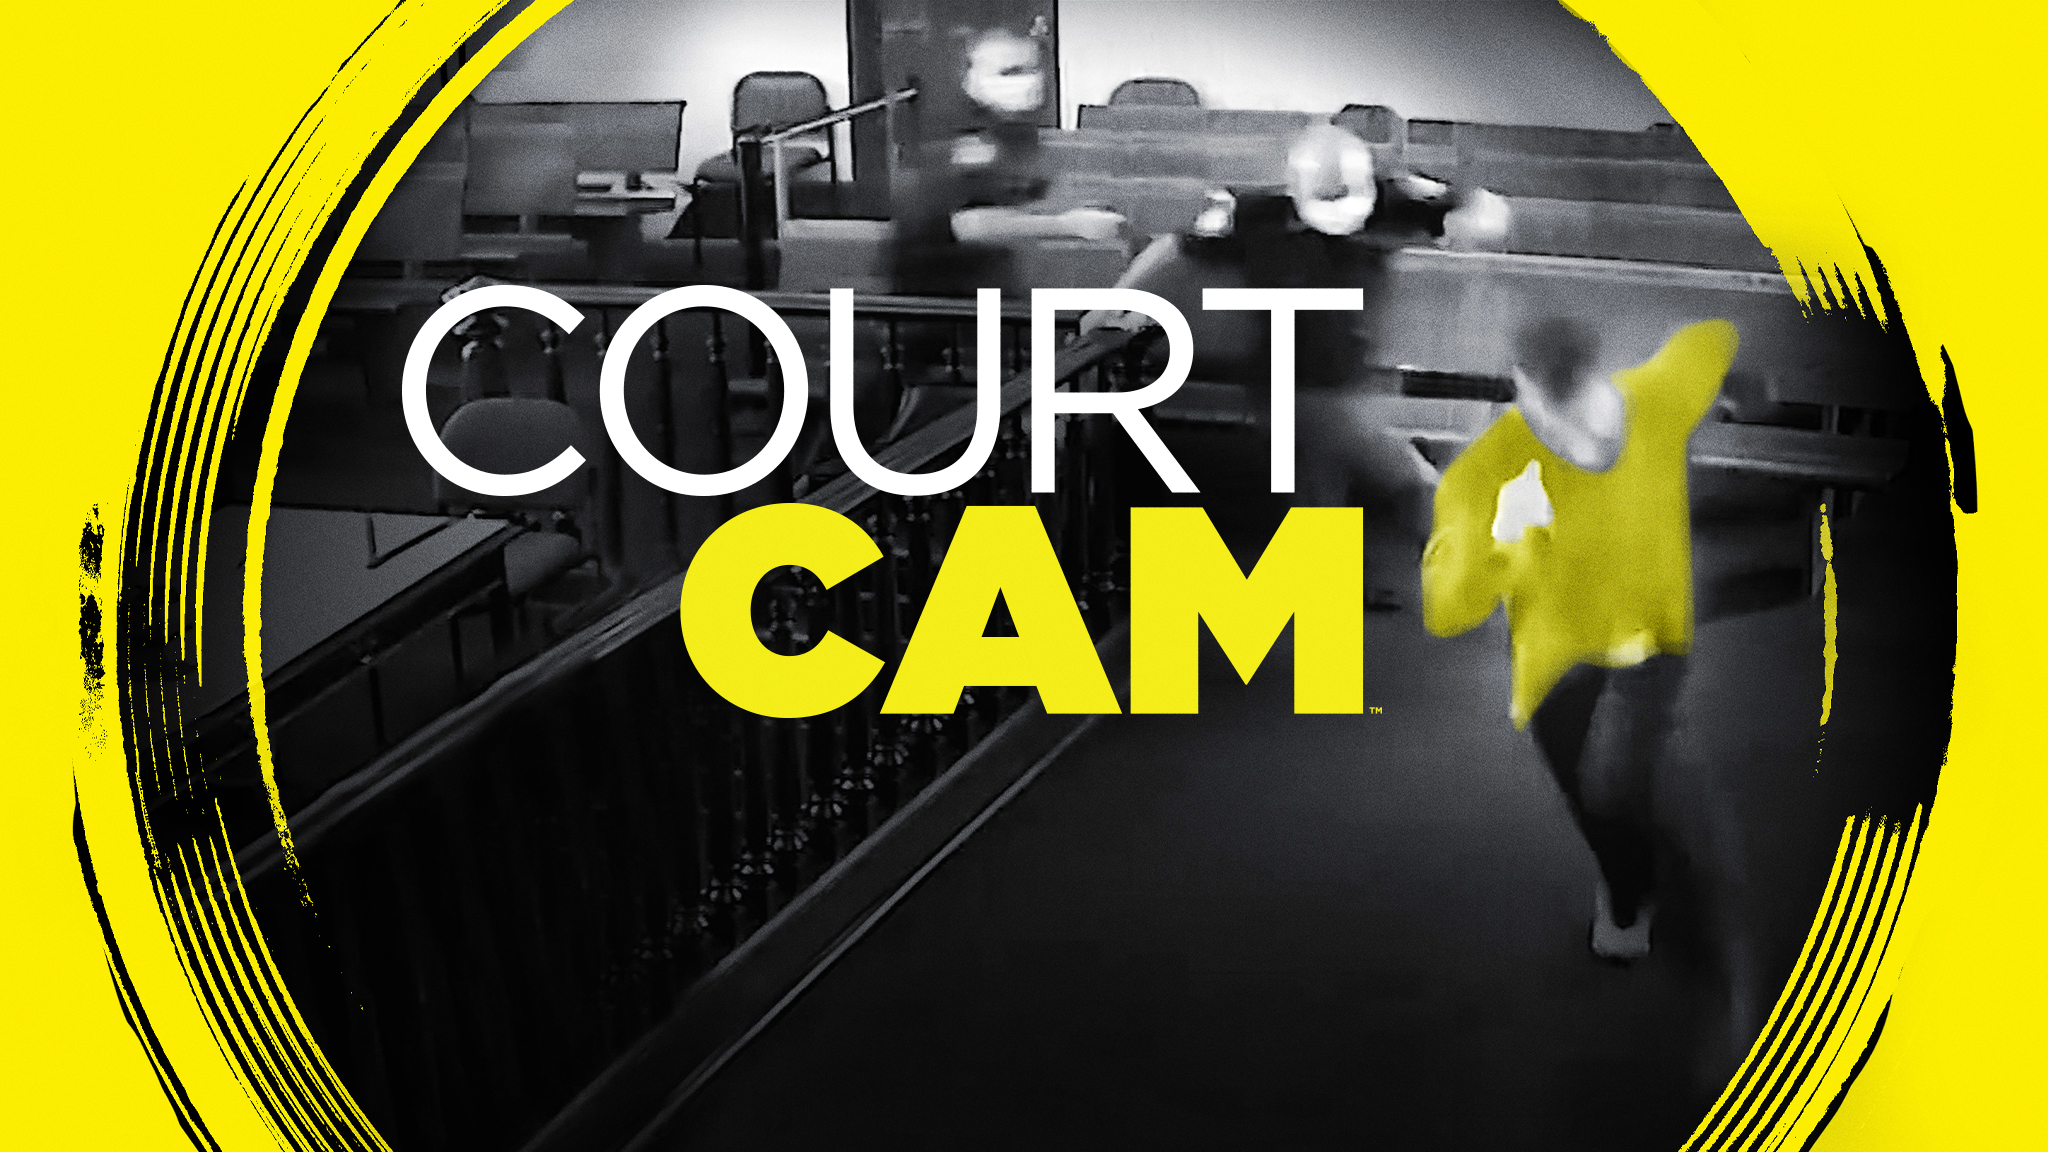 Court Cam Alt Image